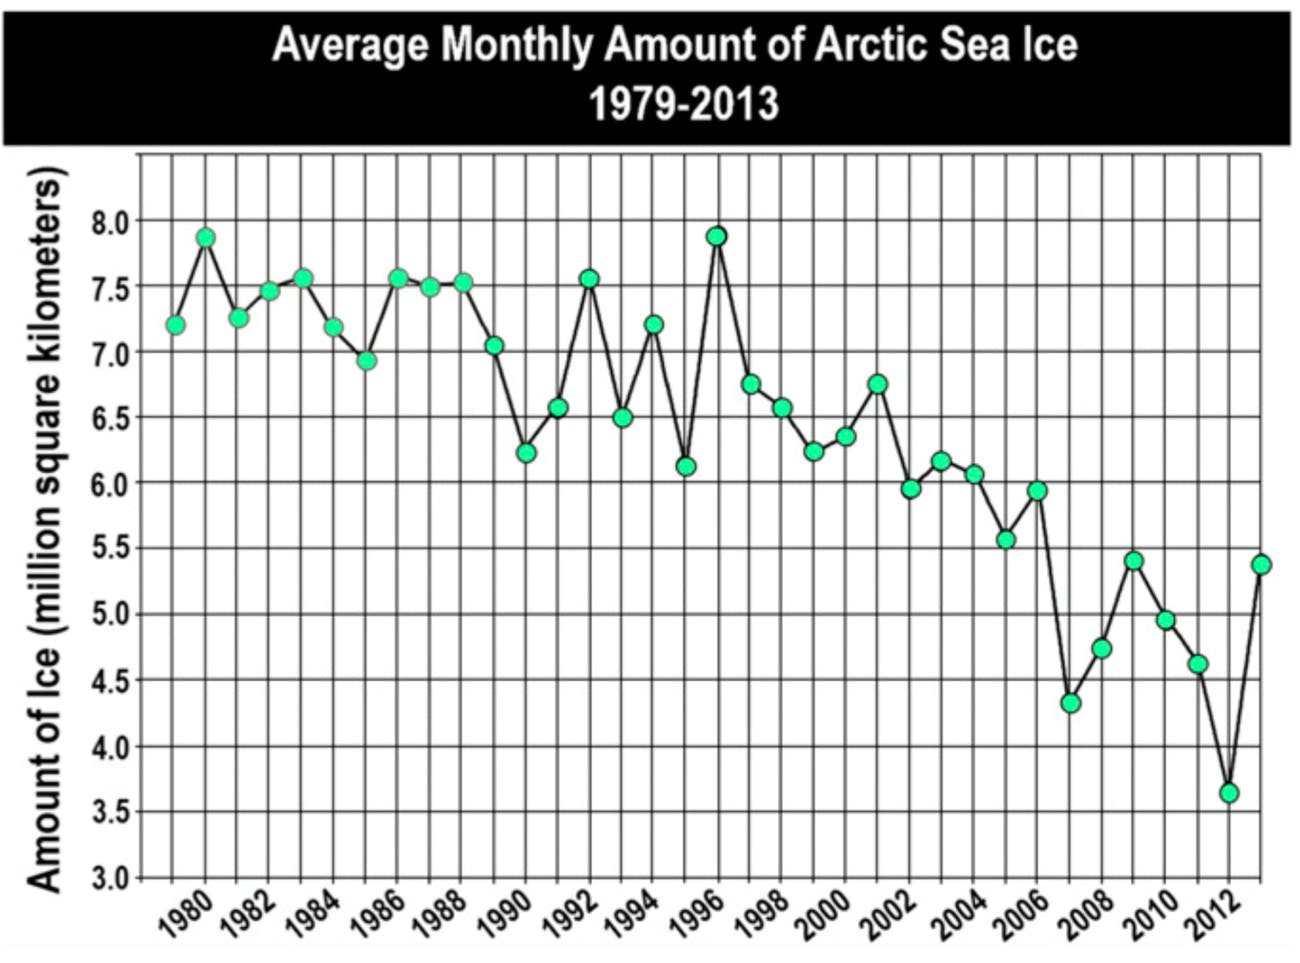 Misinterpretation of Climate Data Comes Down to Political